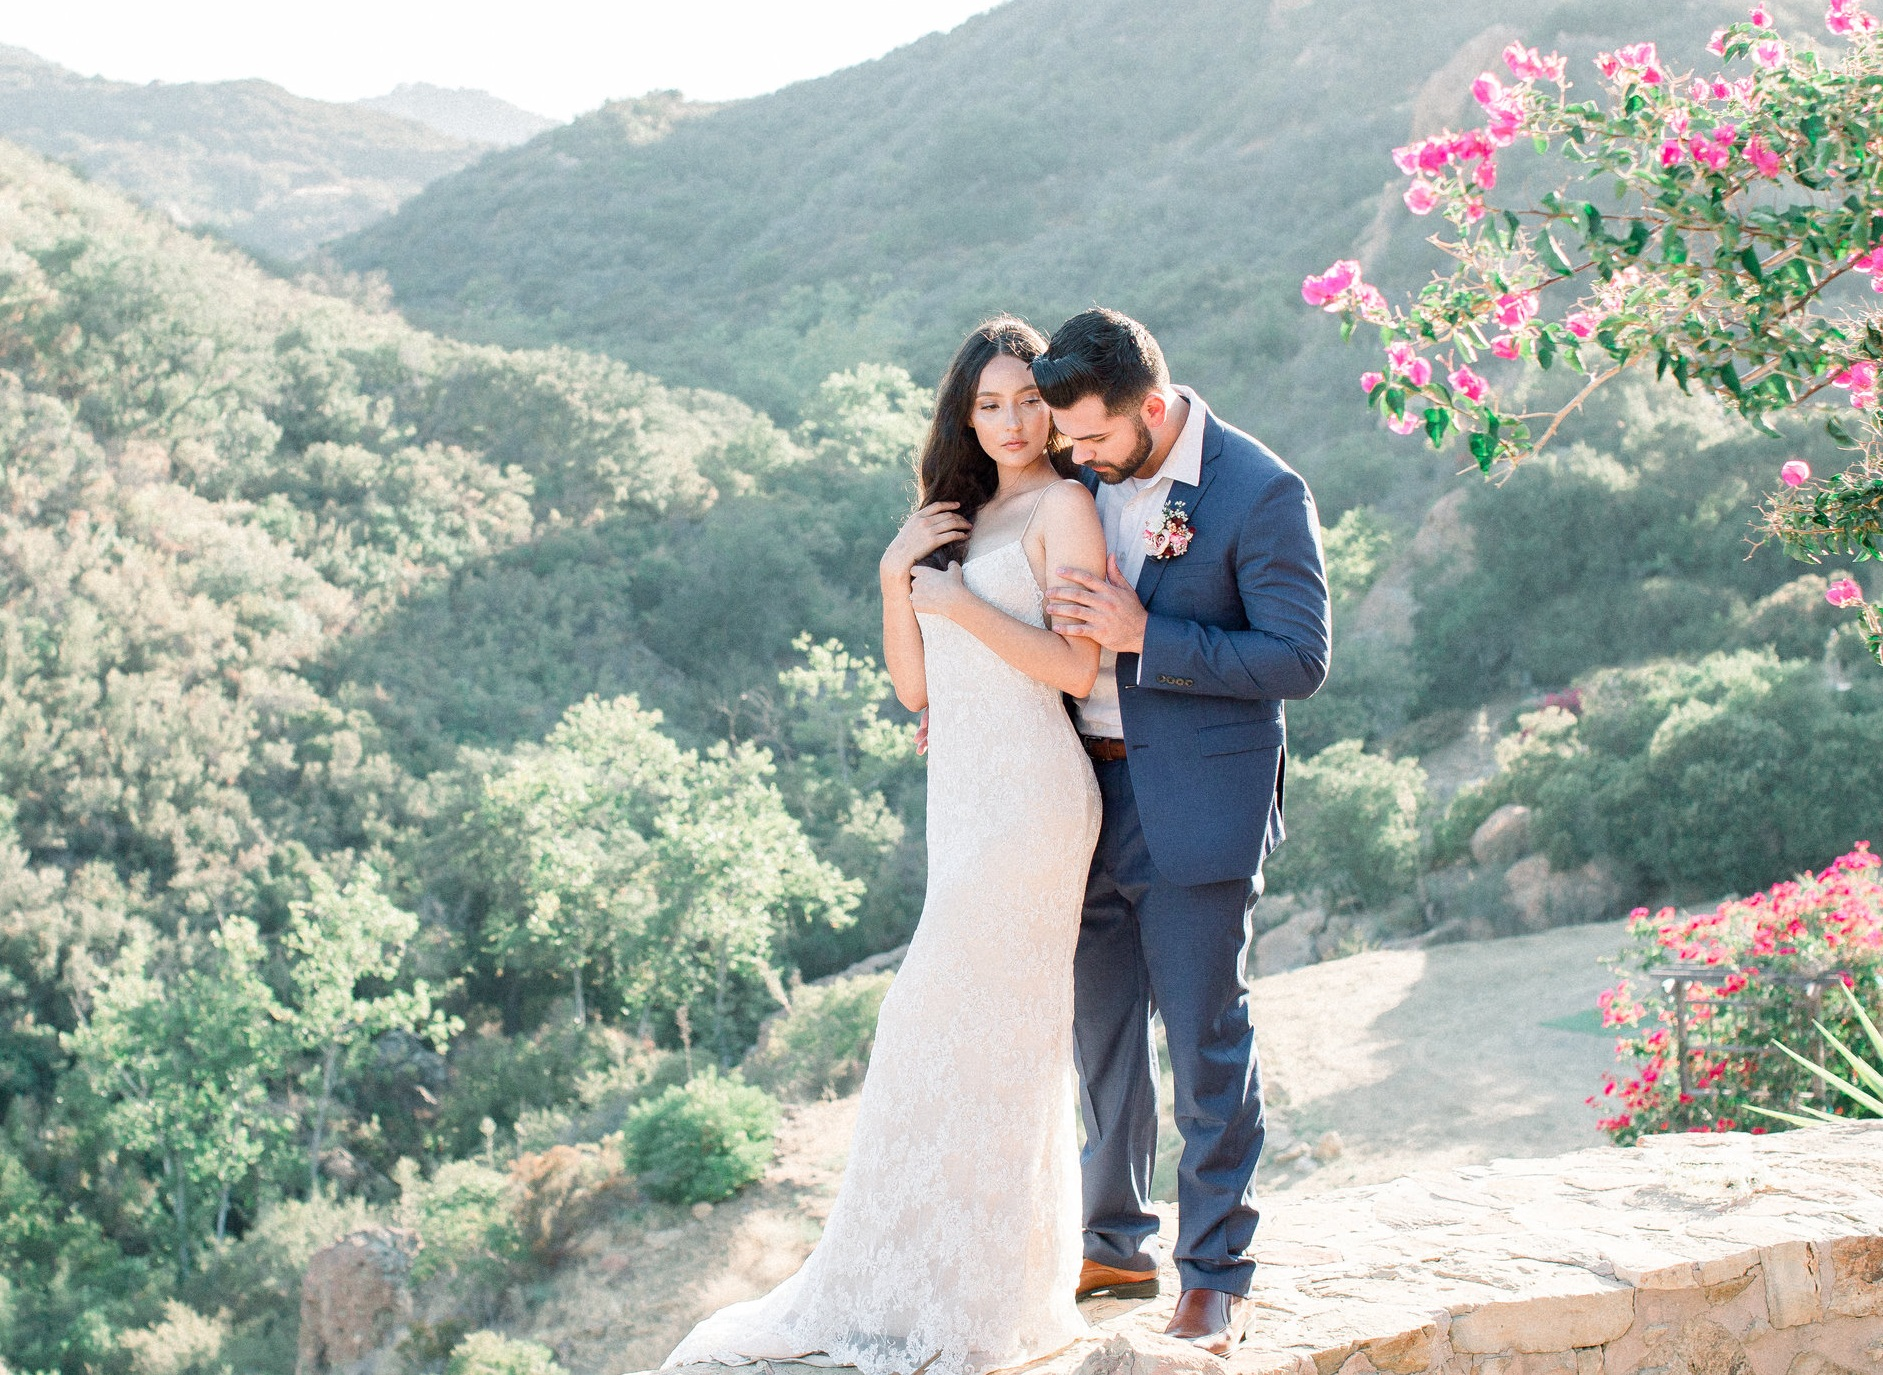 Wedding Planners in Los Angeles